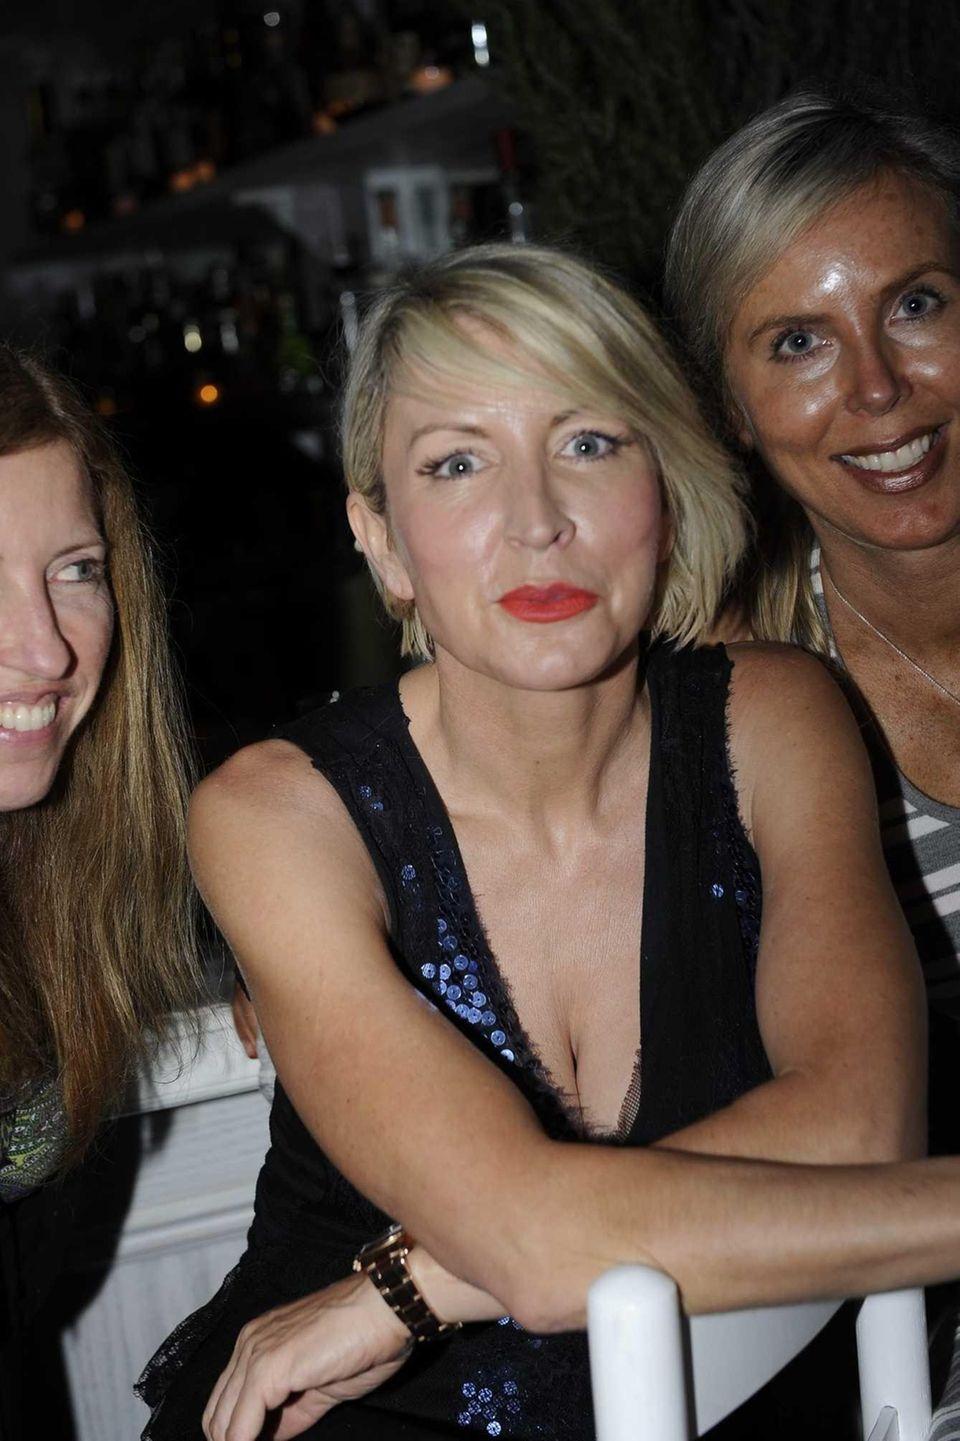 Heather Mills, ex-wife of singer Paul McCartney, hangs